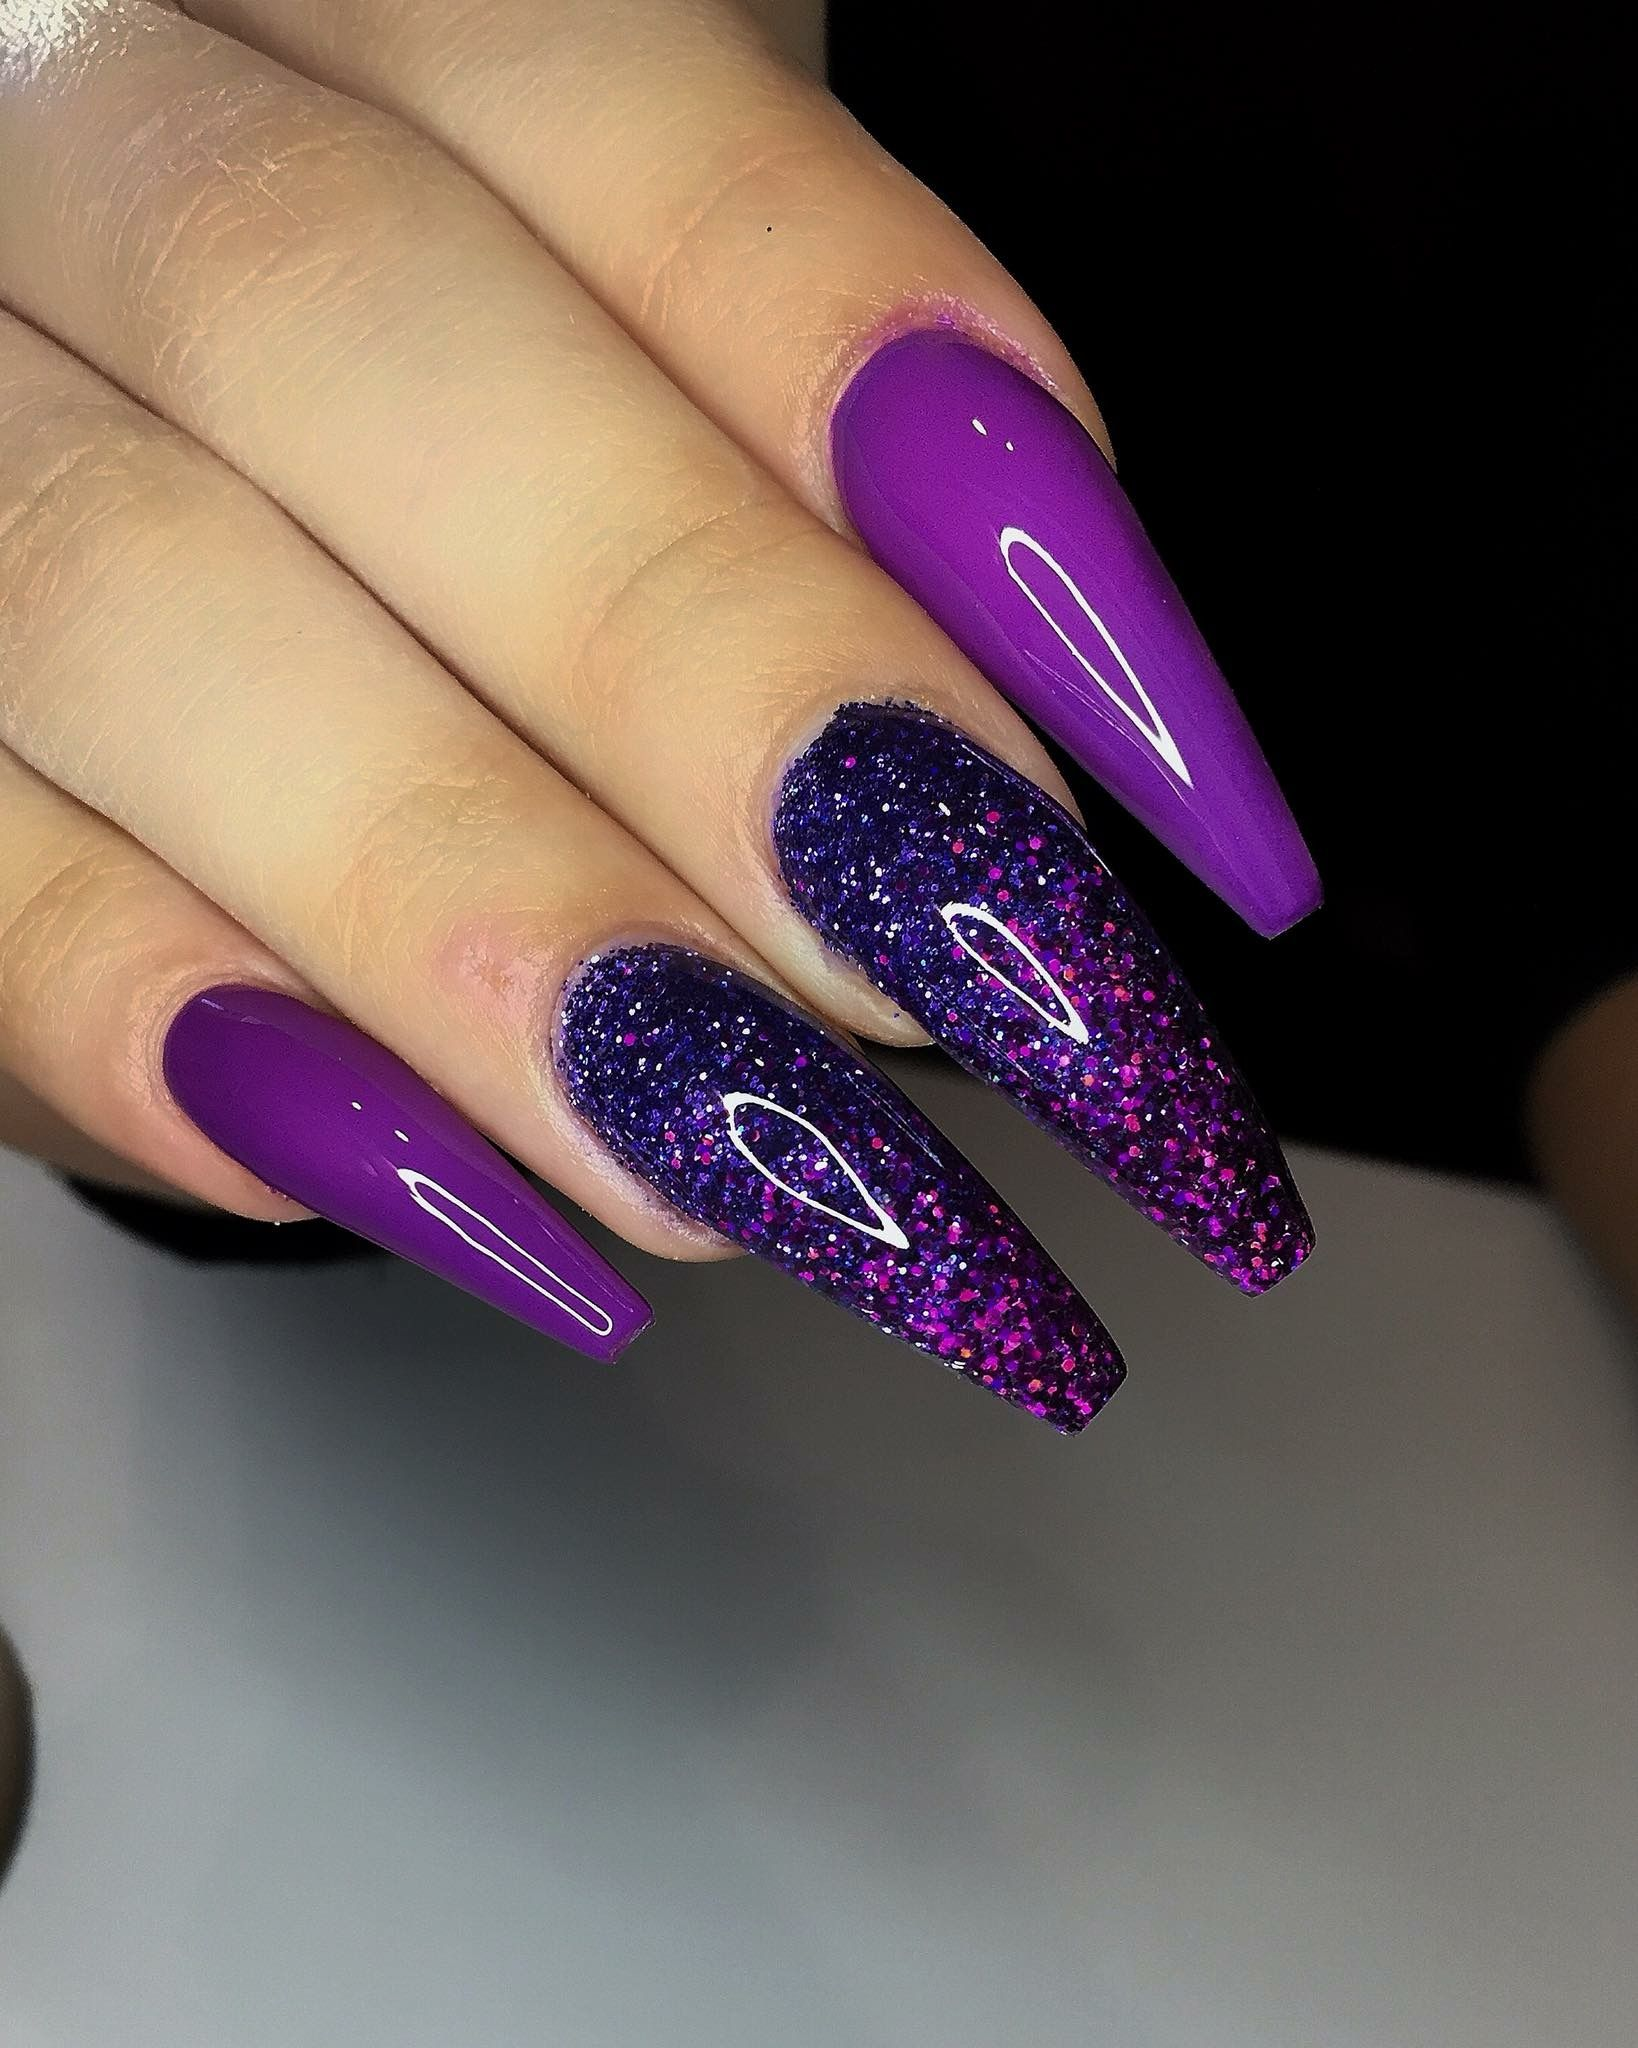 Pinterest Keyannnaa Coffin Nails Designs Purple Nail Designs Pretty Nail Art